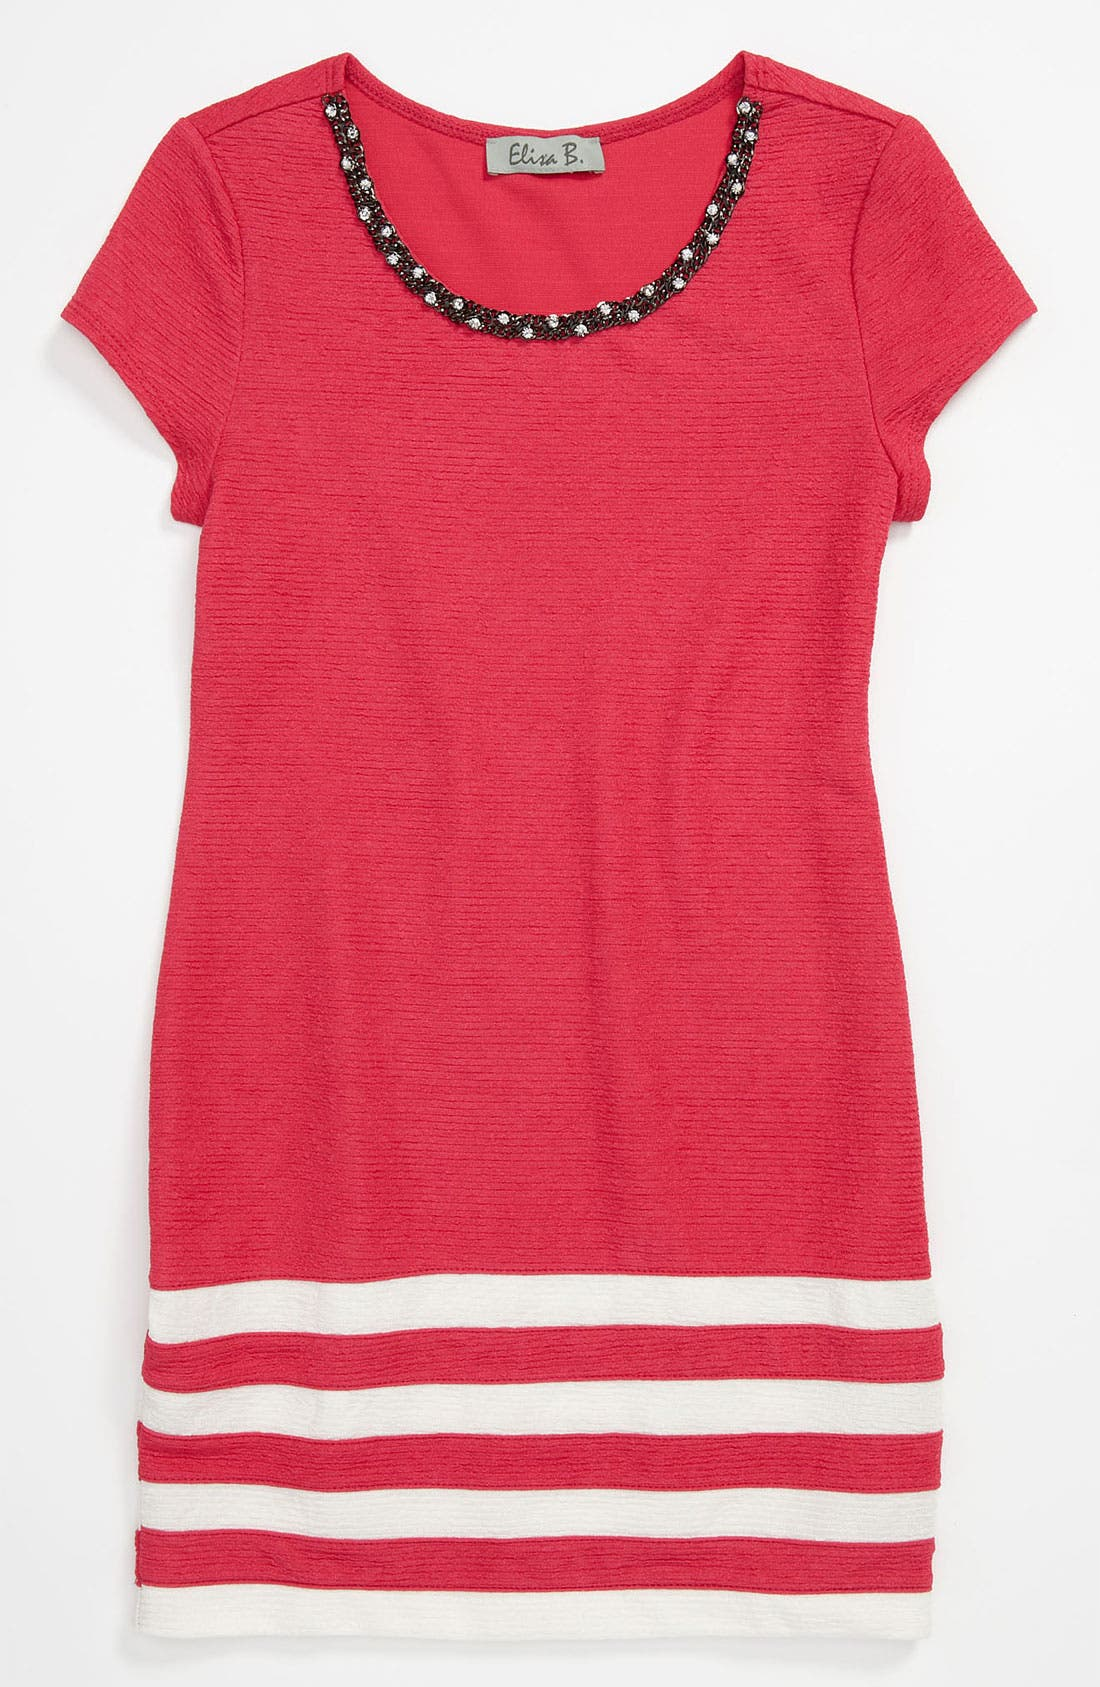 Main Image - Elisa B Knit Dress (Big Girls)